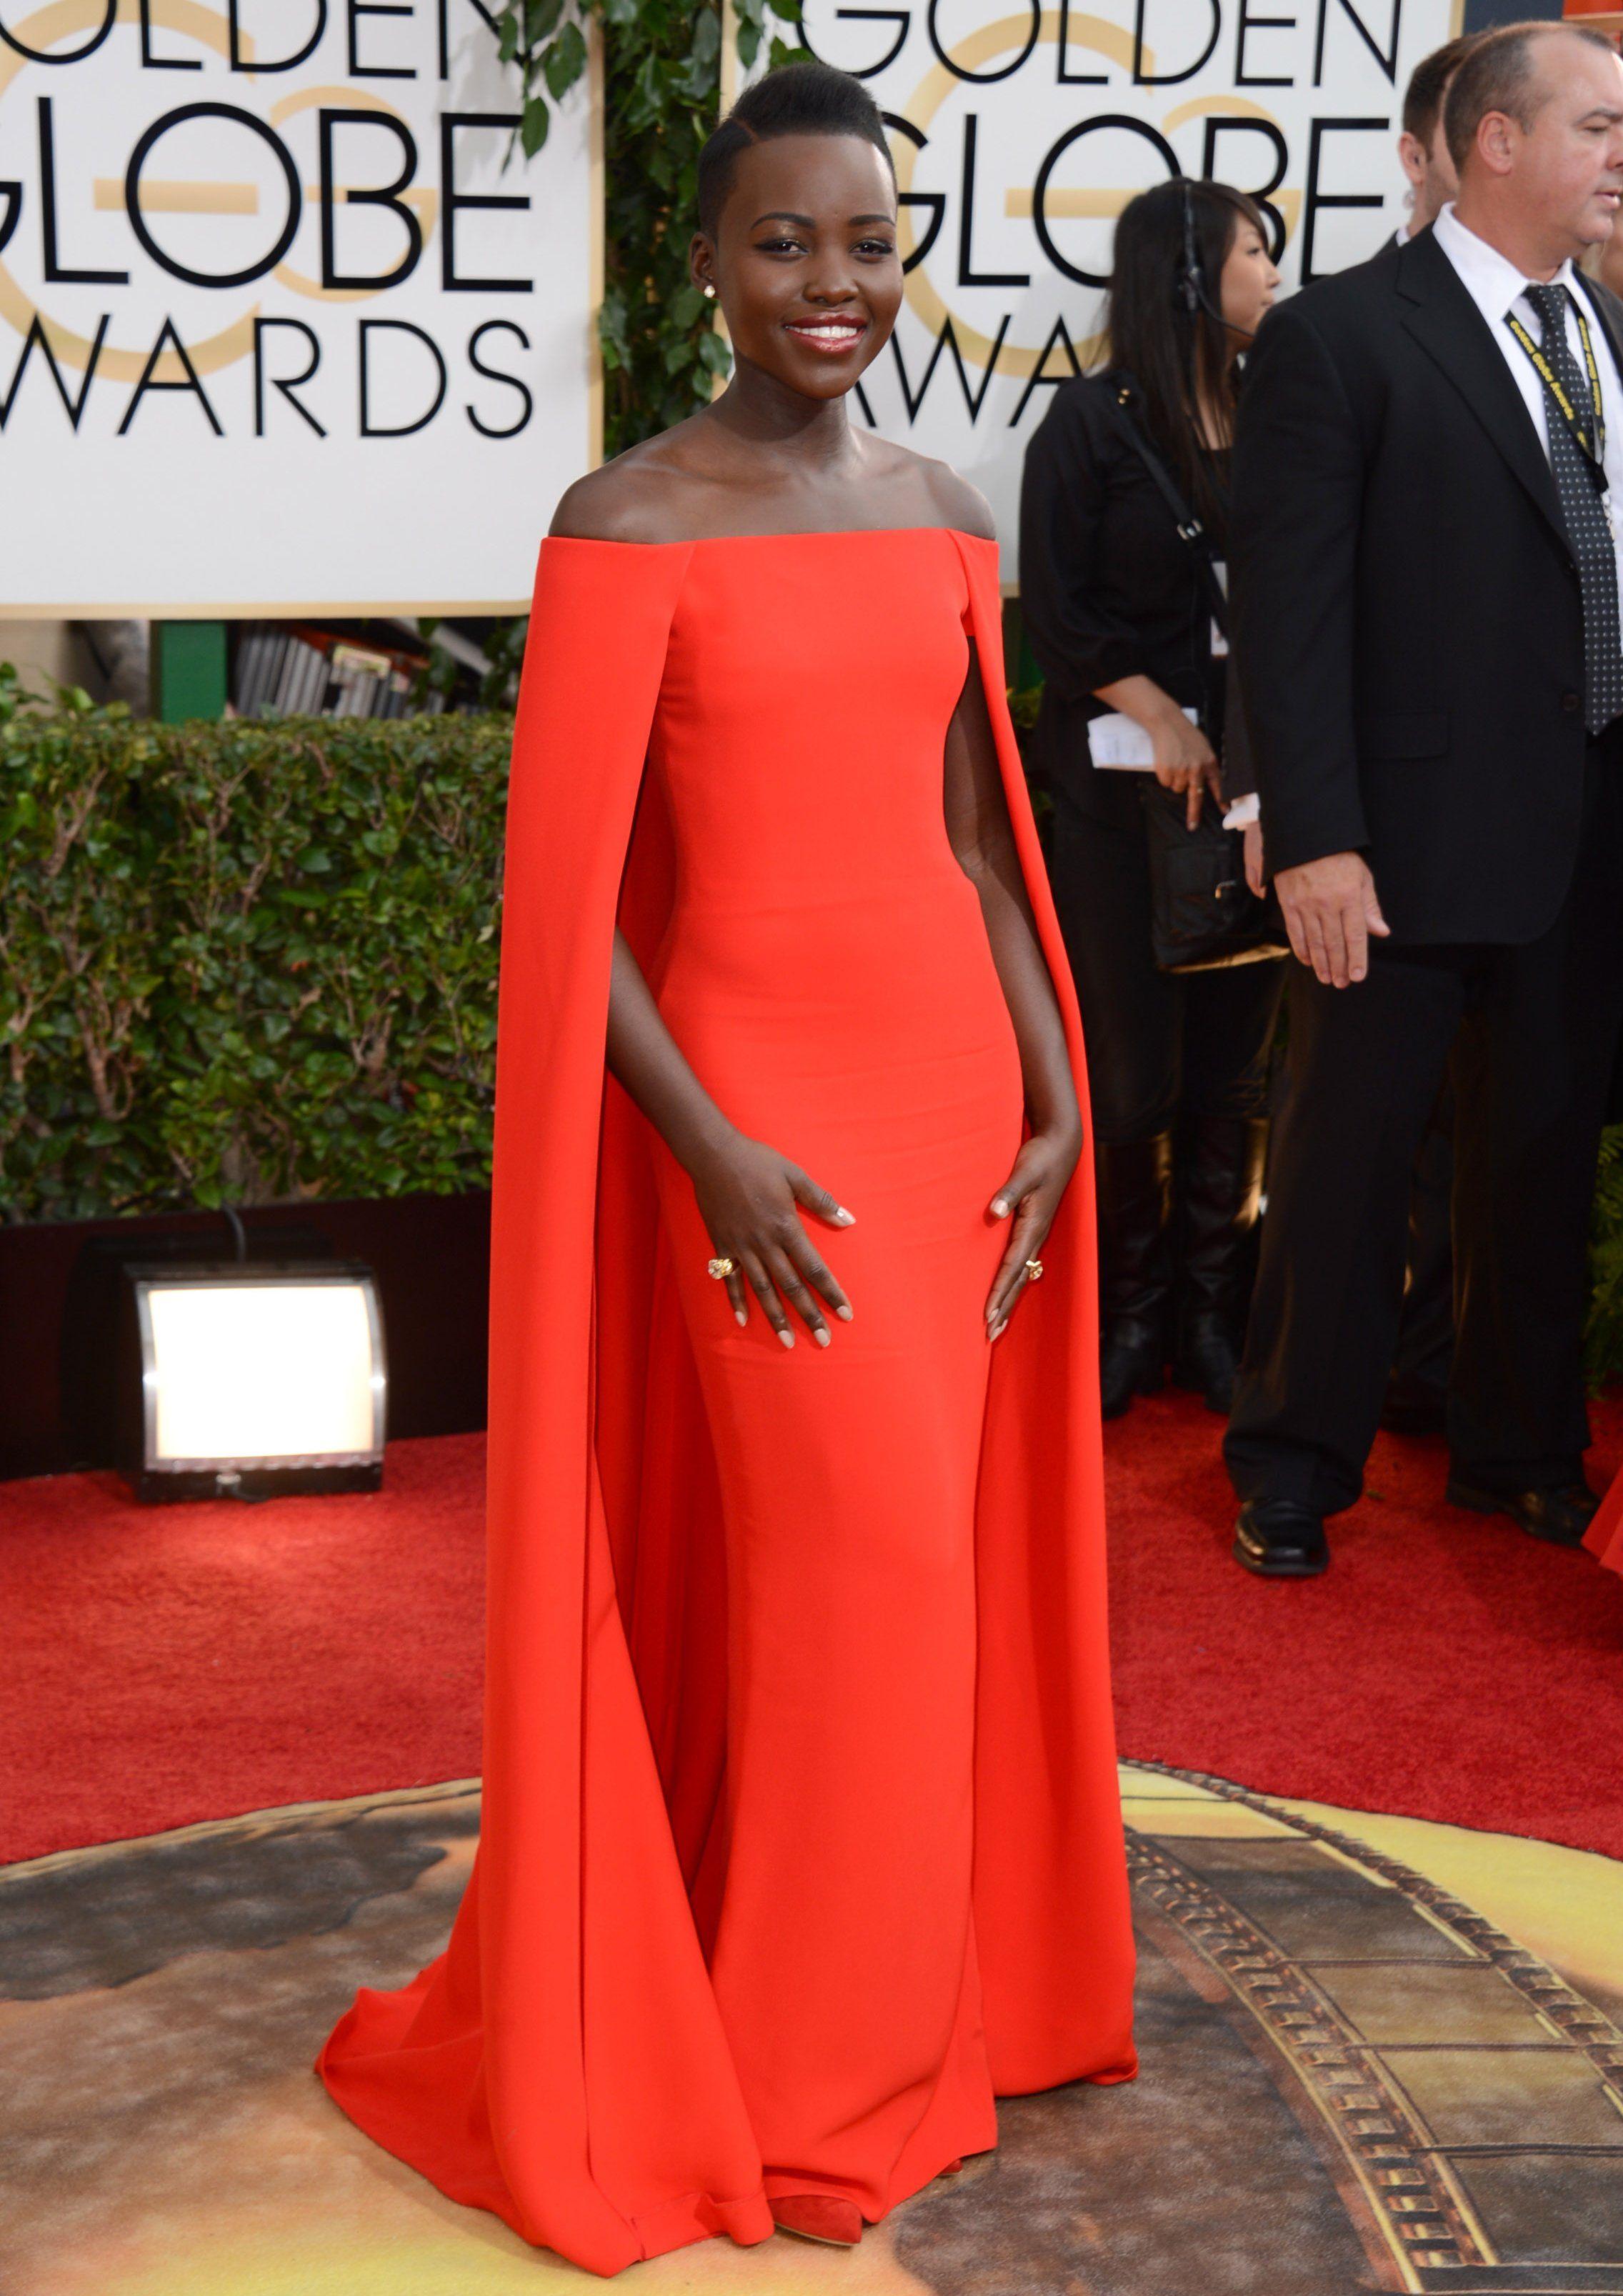 63c1284625ac Lupita Nyong'o: Style Profile | Fashion | Formal dresses, Red carpet ...